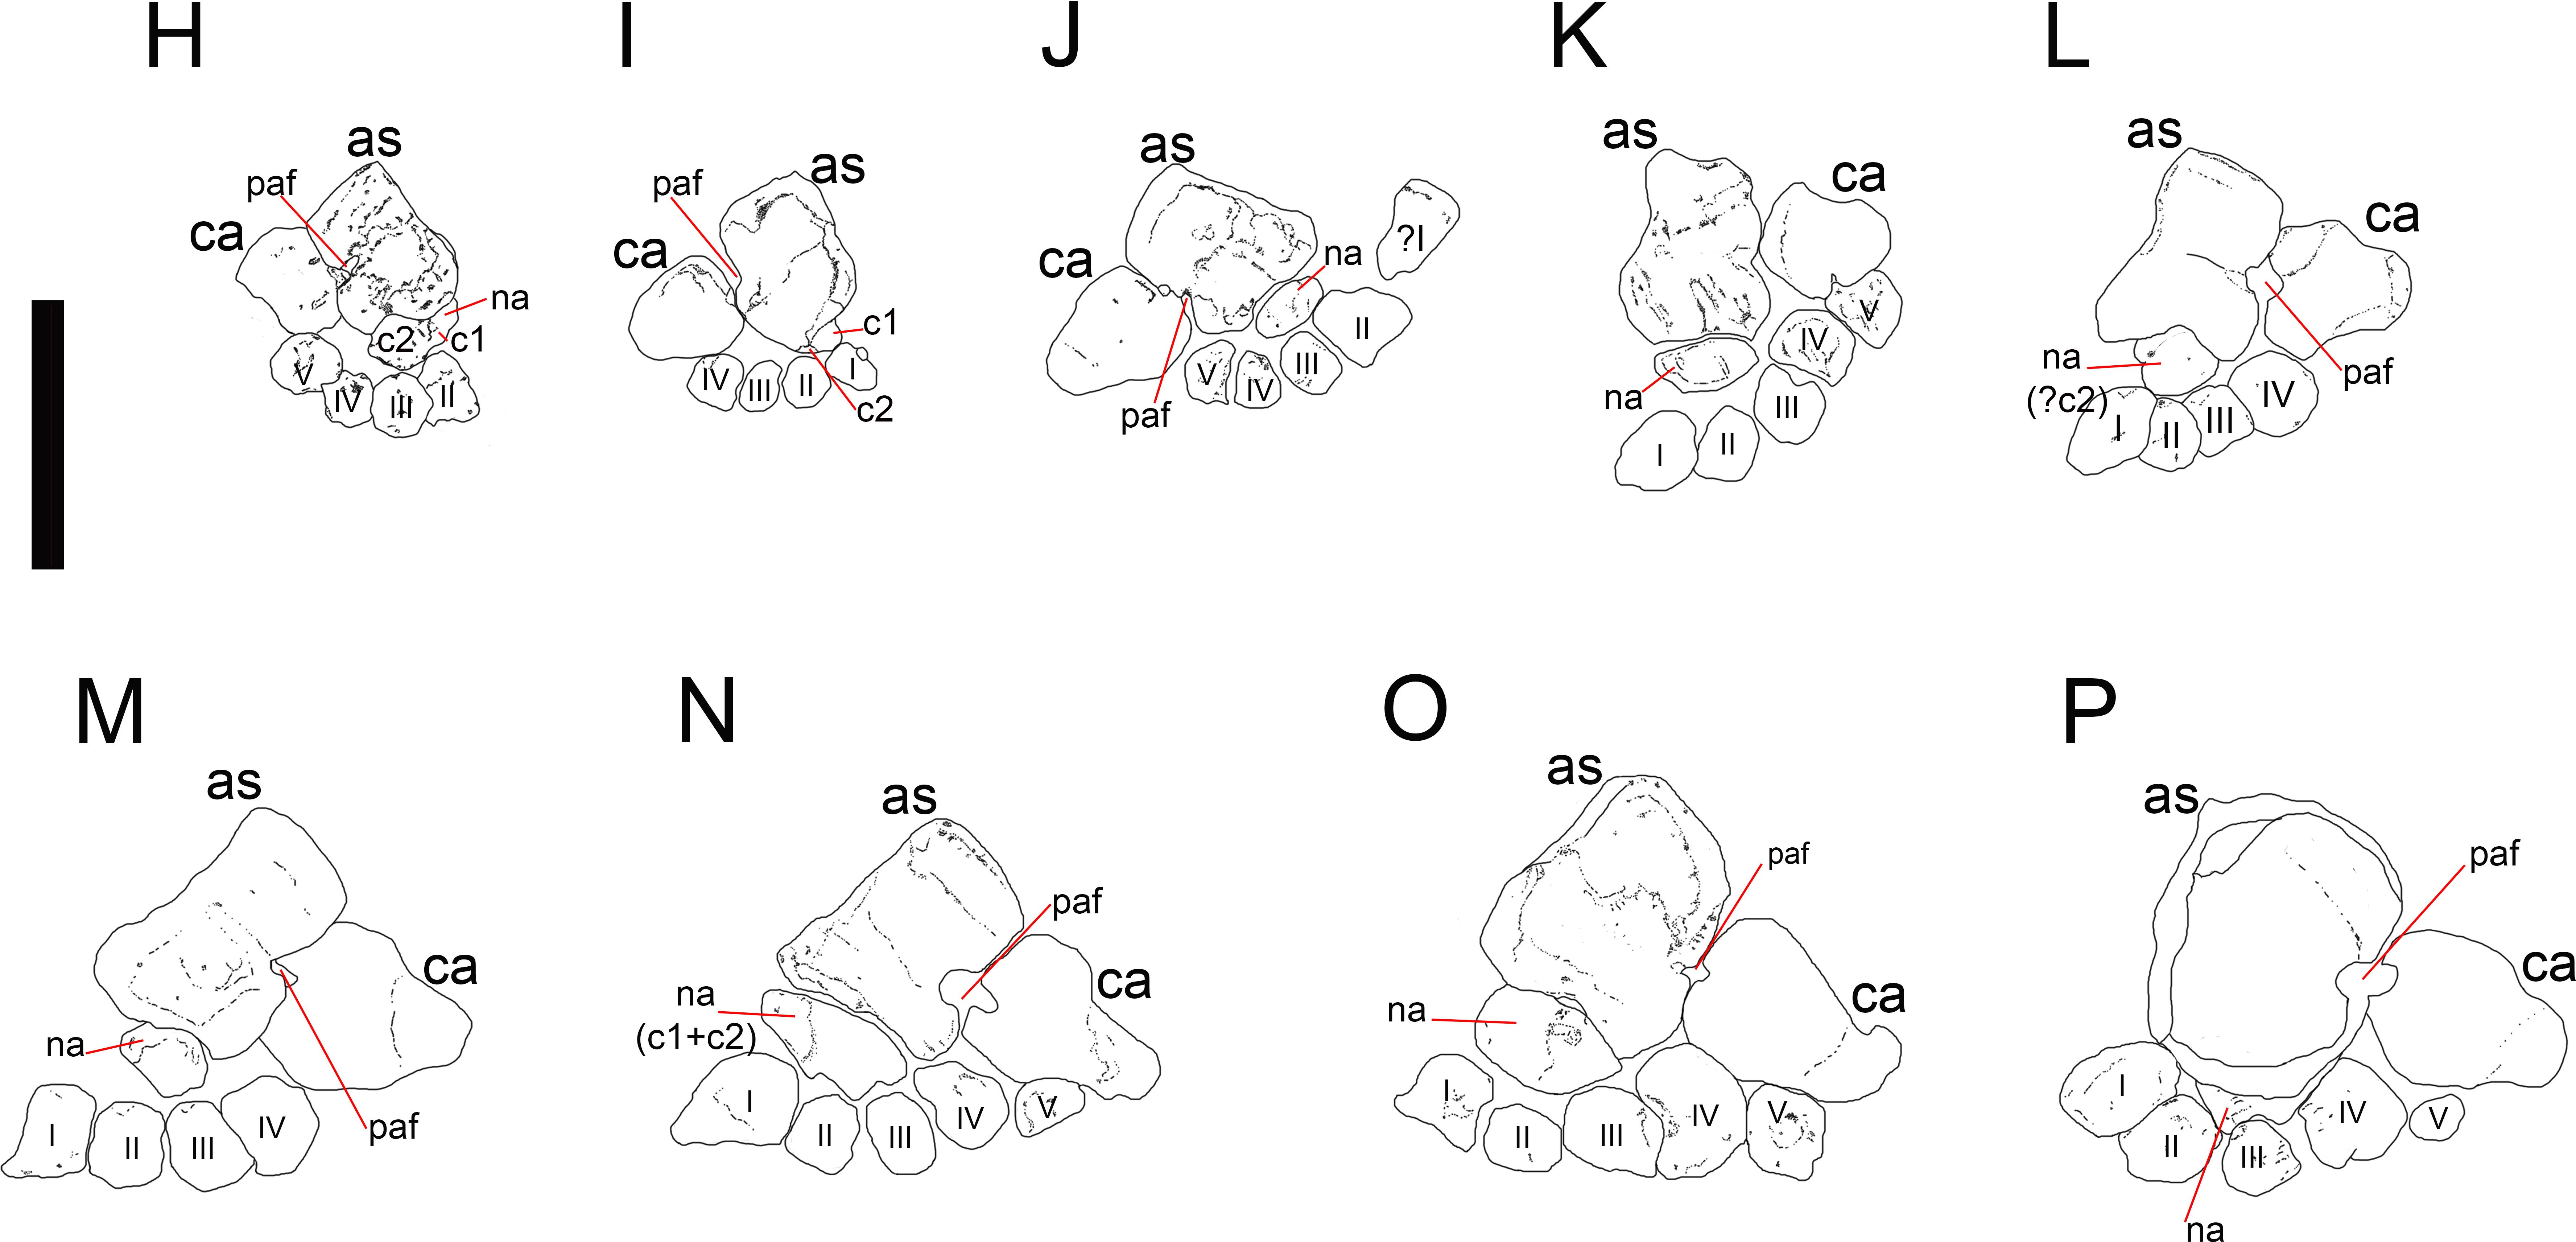 Sistematica evolutiva yahoo dating